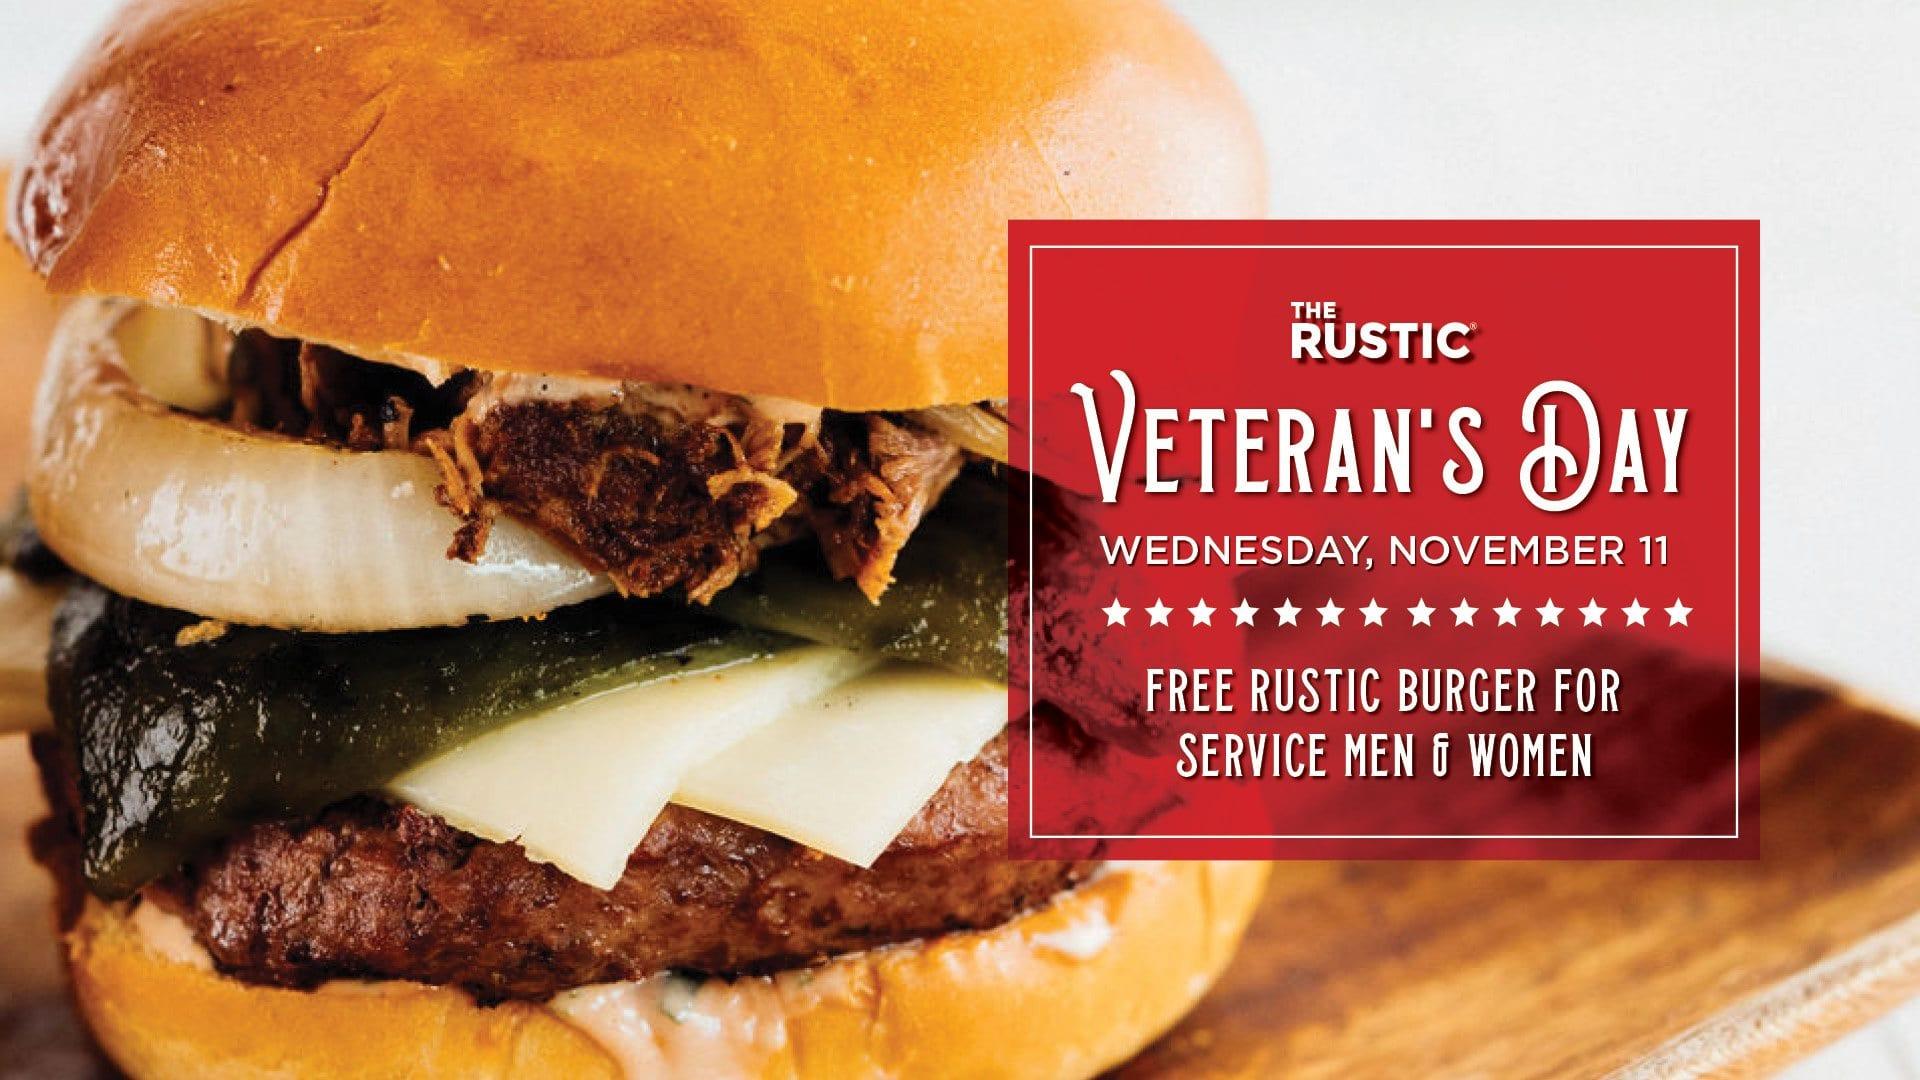 Rustic Veterans Day flyer